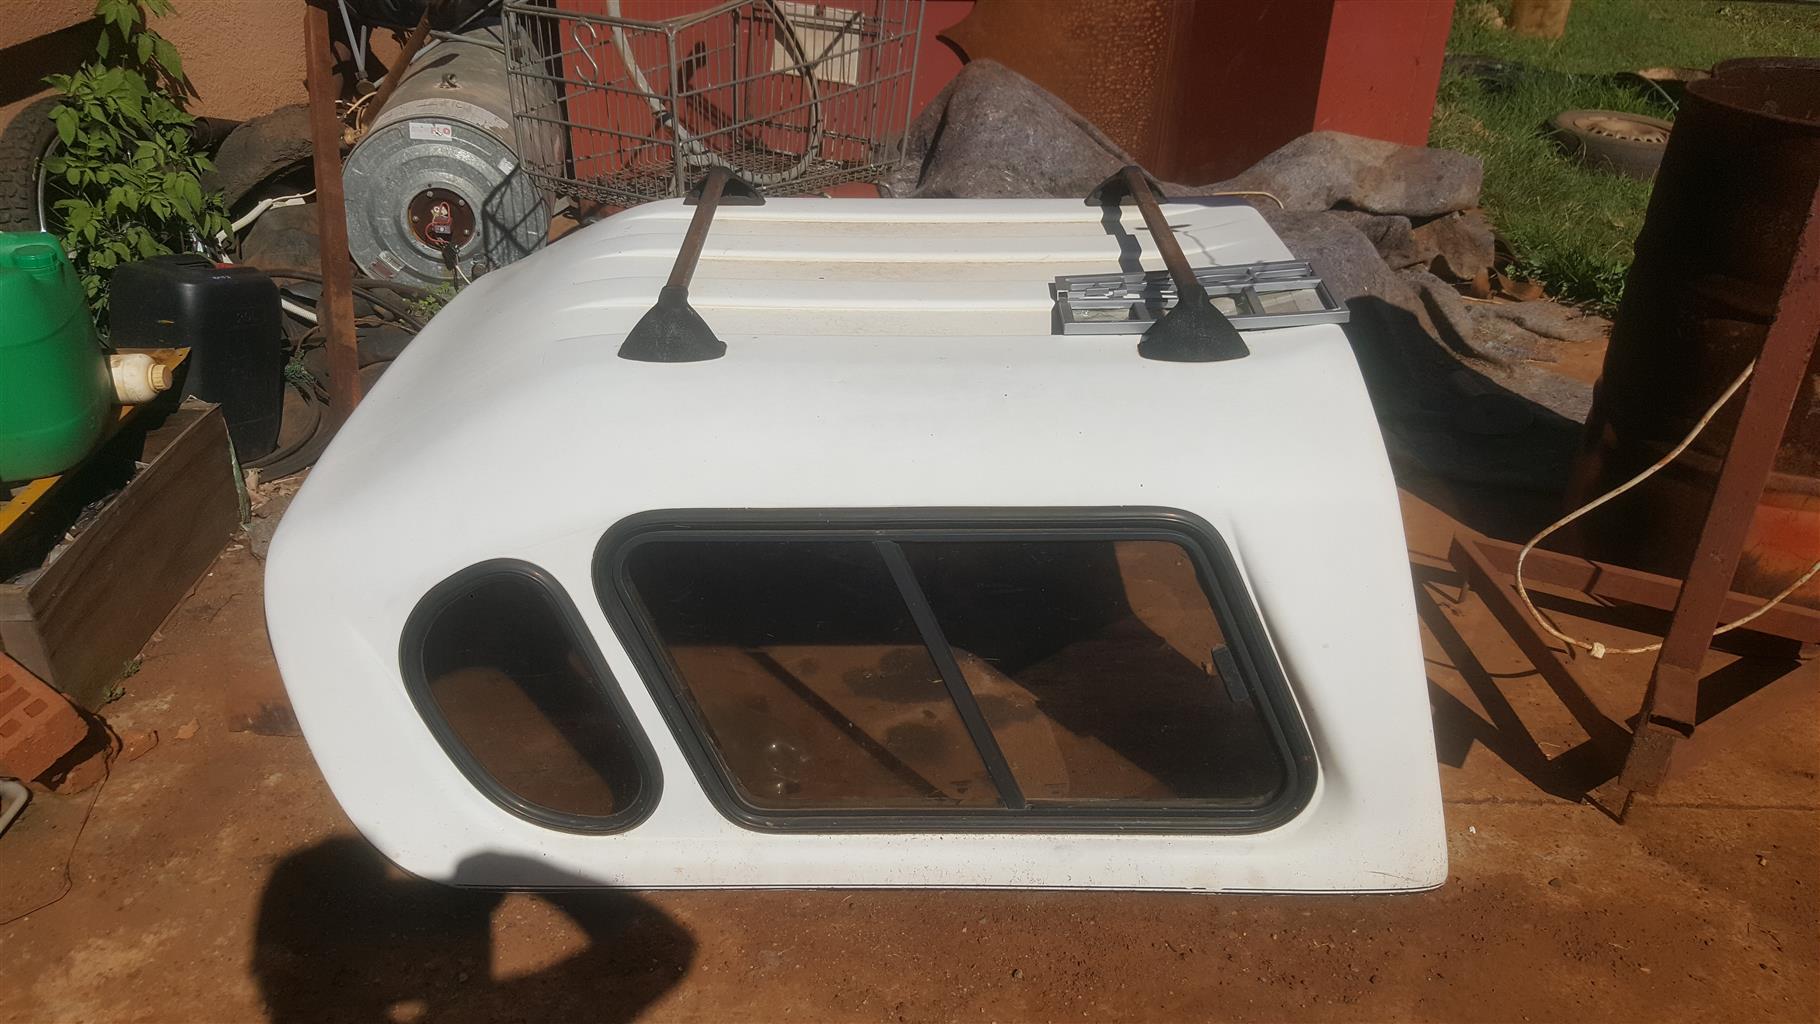 Old shape corsa bakkie canopy for sale.